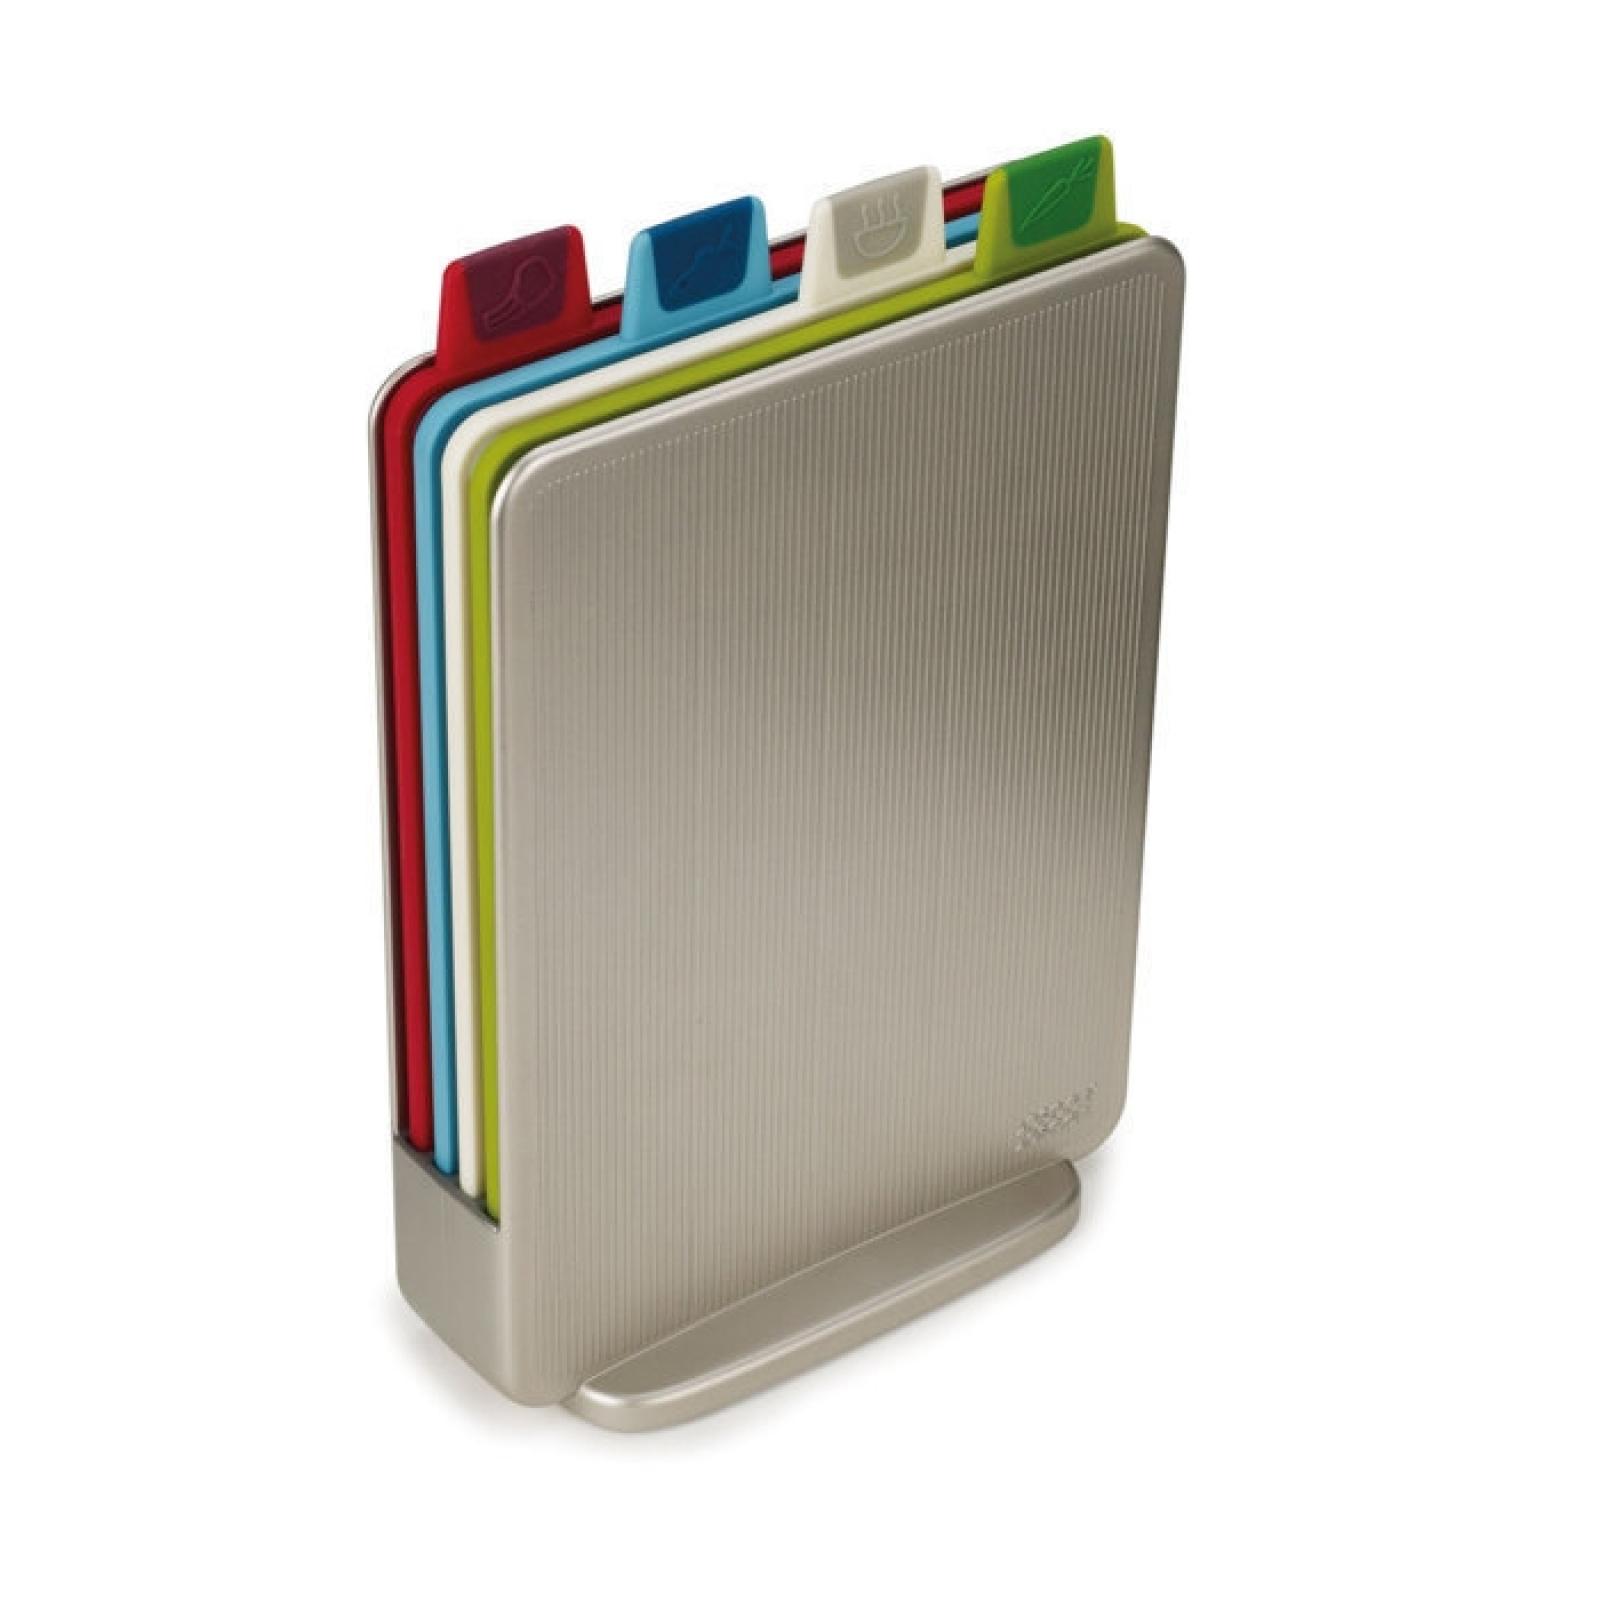 Онлайн каталог PROMENU: Набор из разделочных досок в кейсе Joseph Joseph Indeх Mini, 20,5х15 см, серый, 5 предметов Joseph Joseph 60097